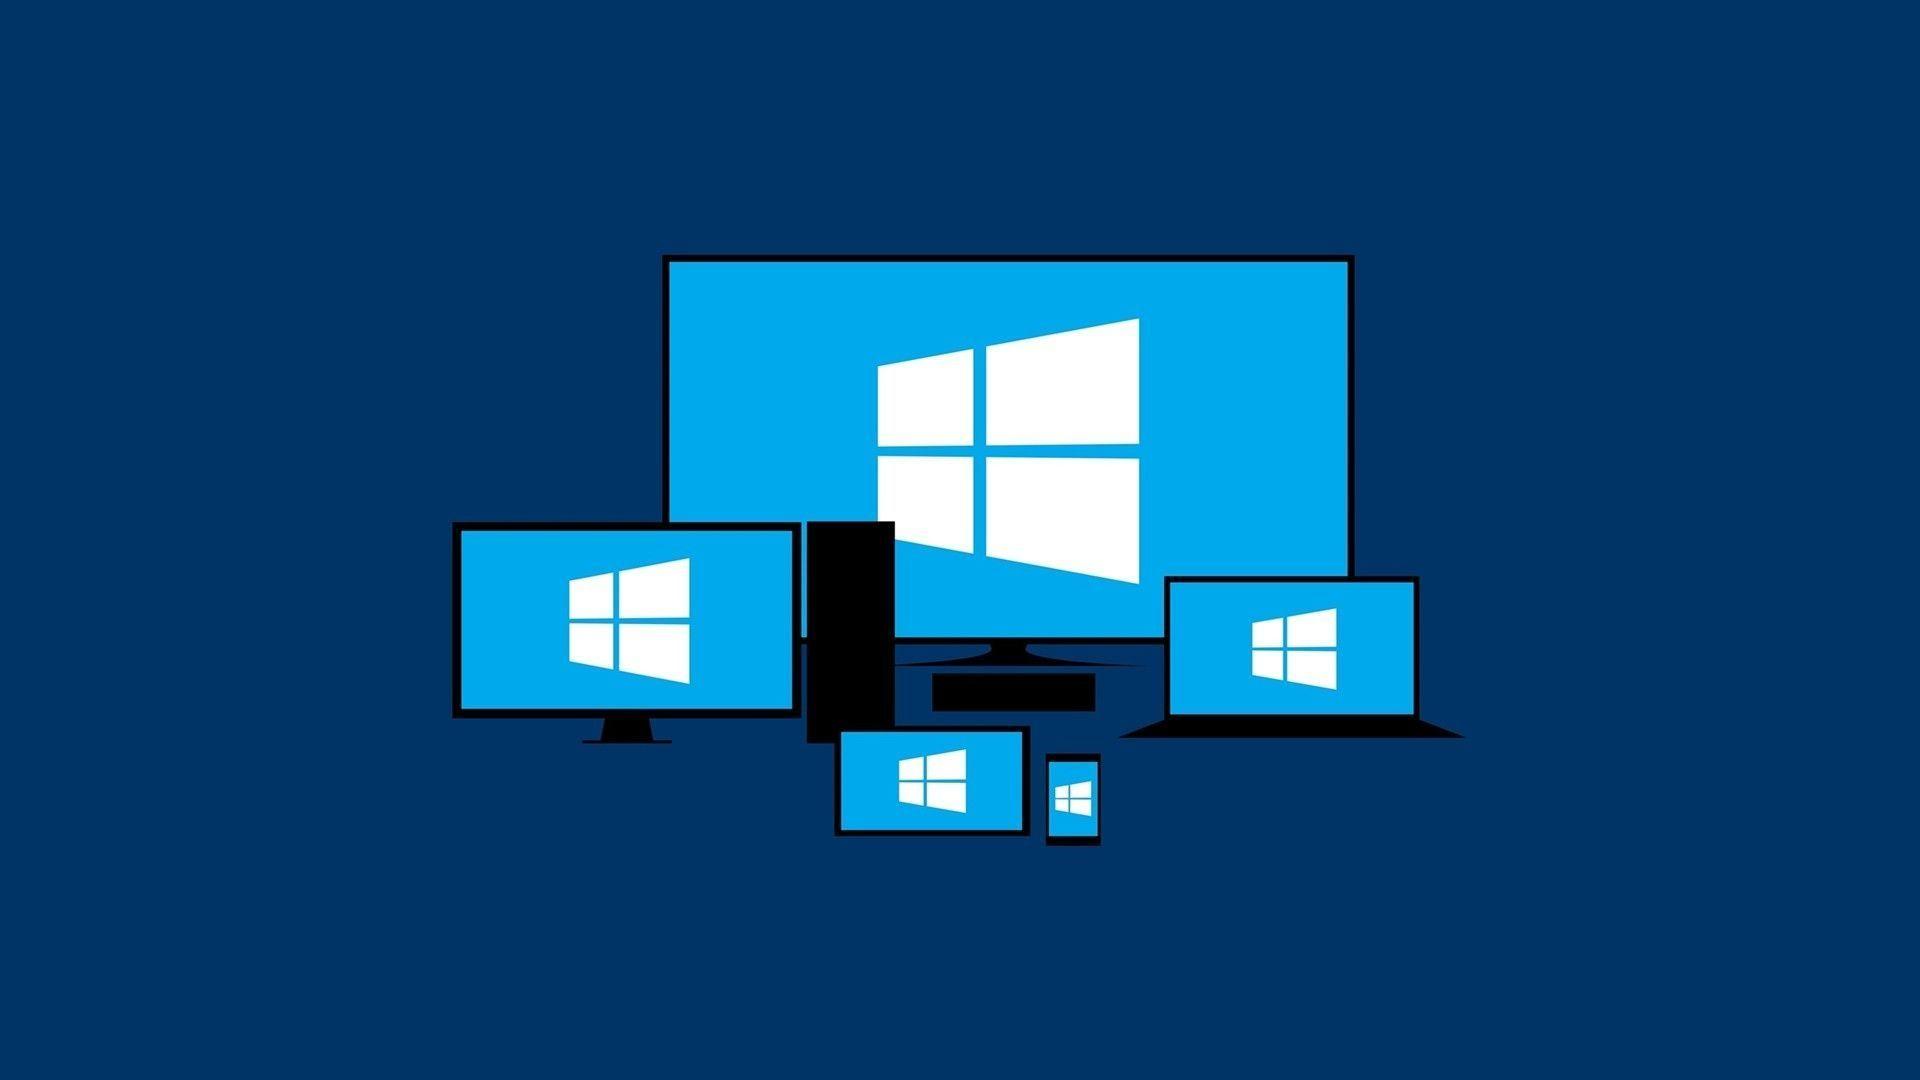 19201080 New Windows Logos Windows 10 Wallpapers 4k 4k Windows 10 Windows 10 Operating System Windows